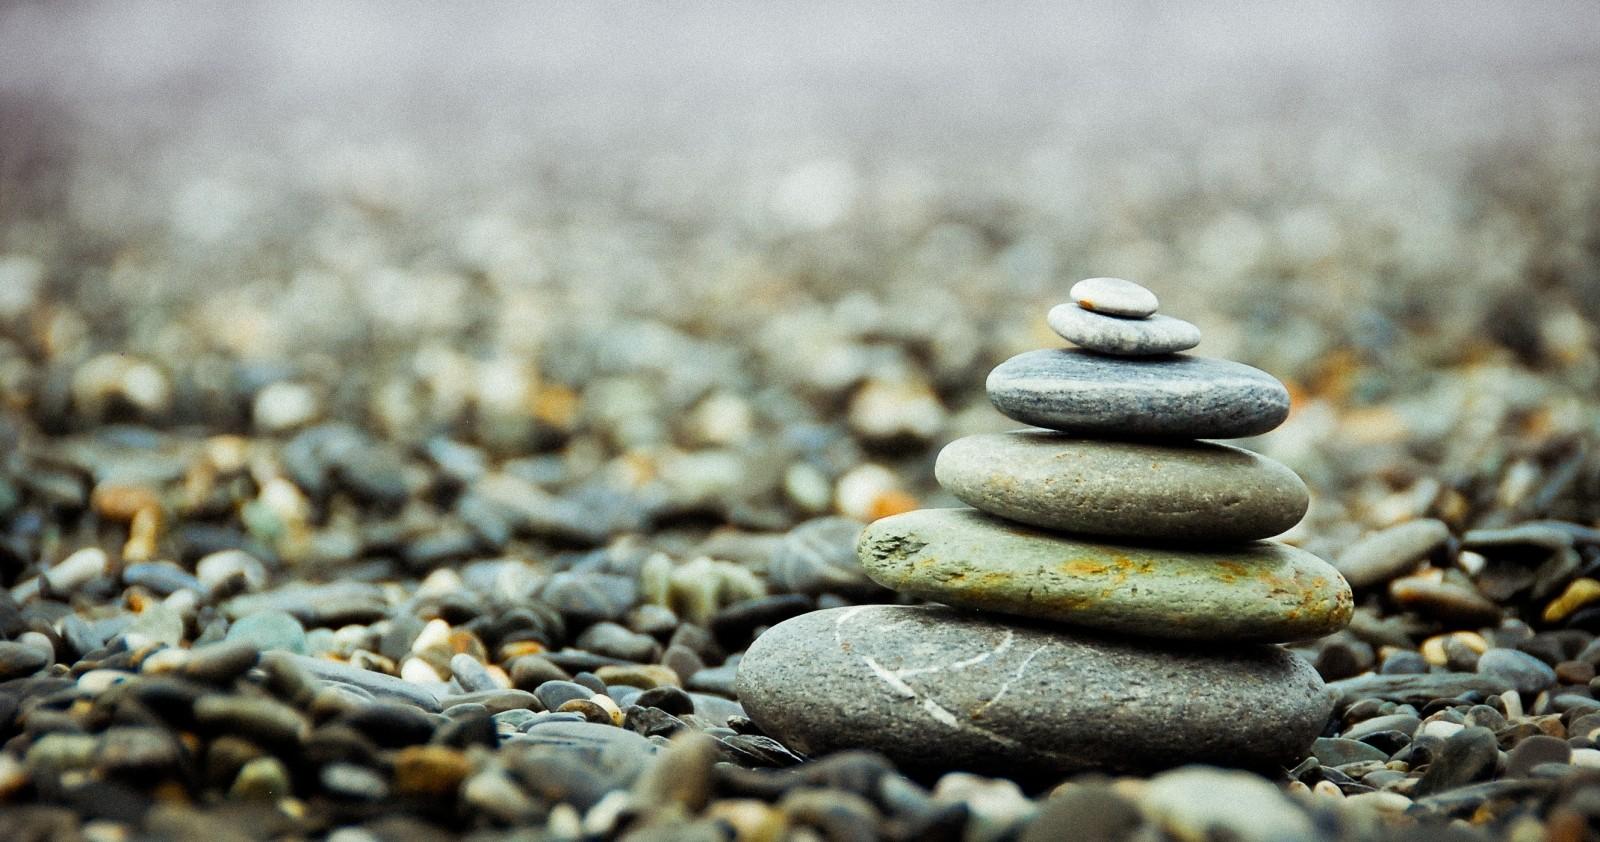 stones-pebbles-stack-pile-zen-balance-meditation